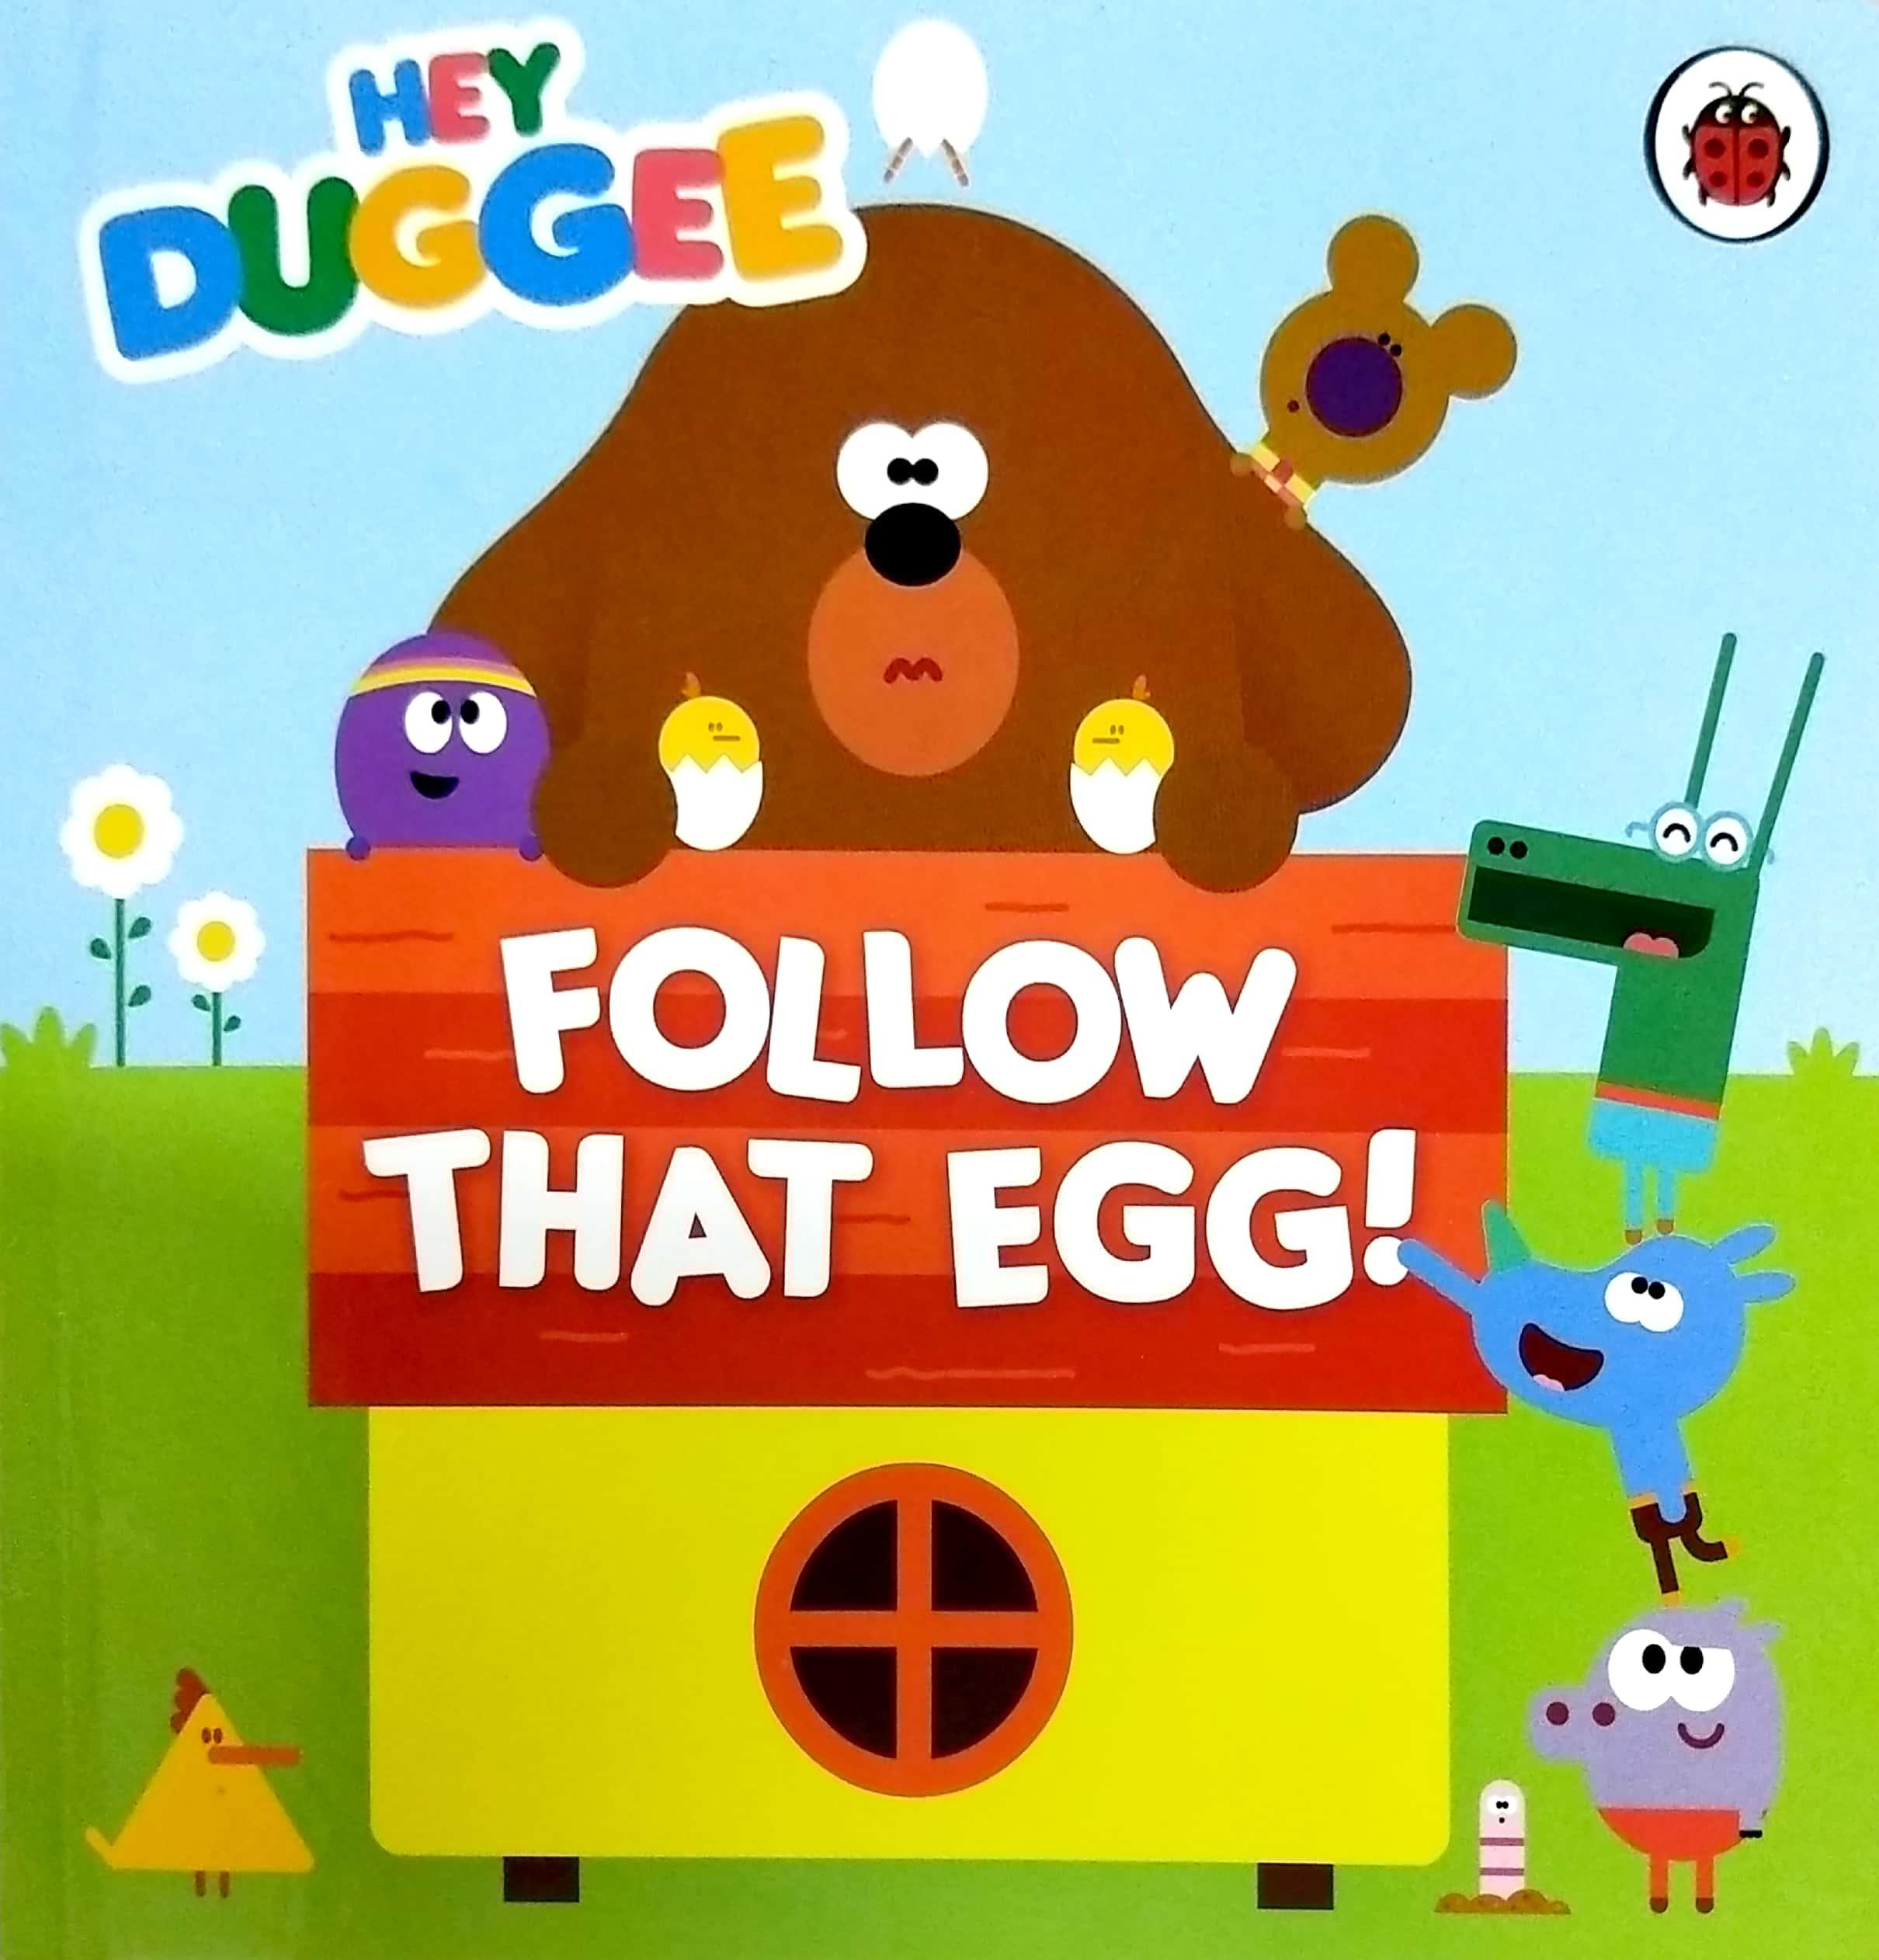 Hey Duggee:Follow that egg! 跟着那只蛋